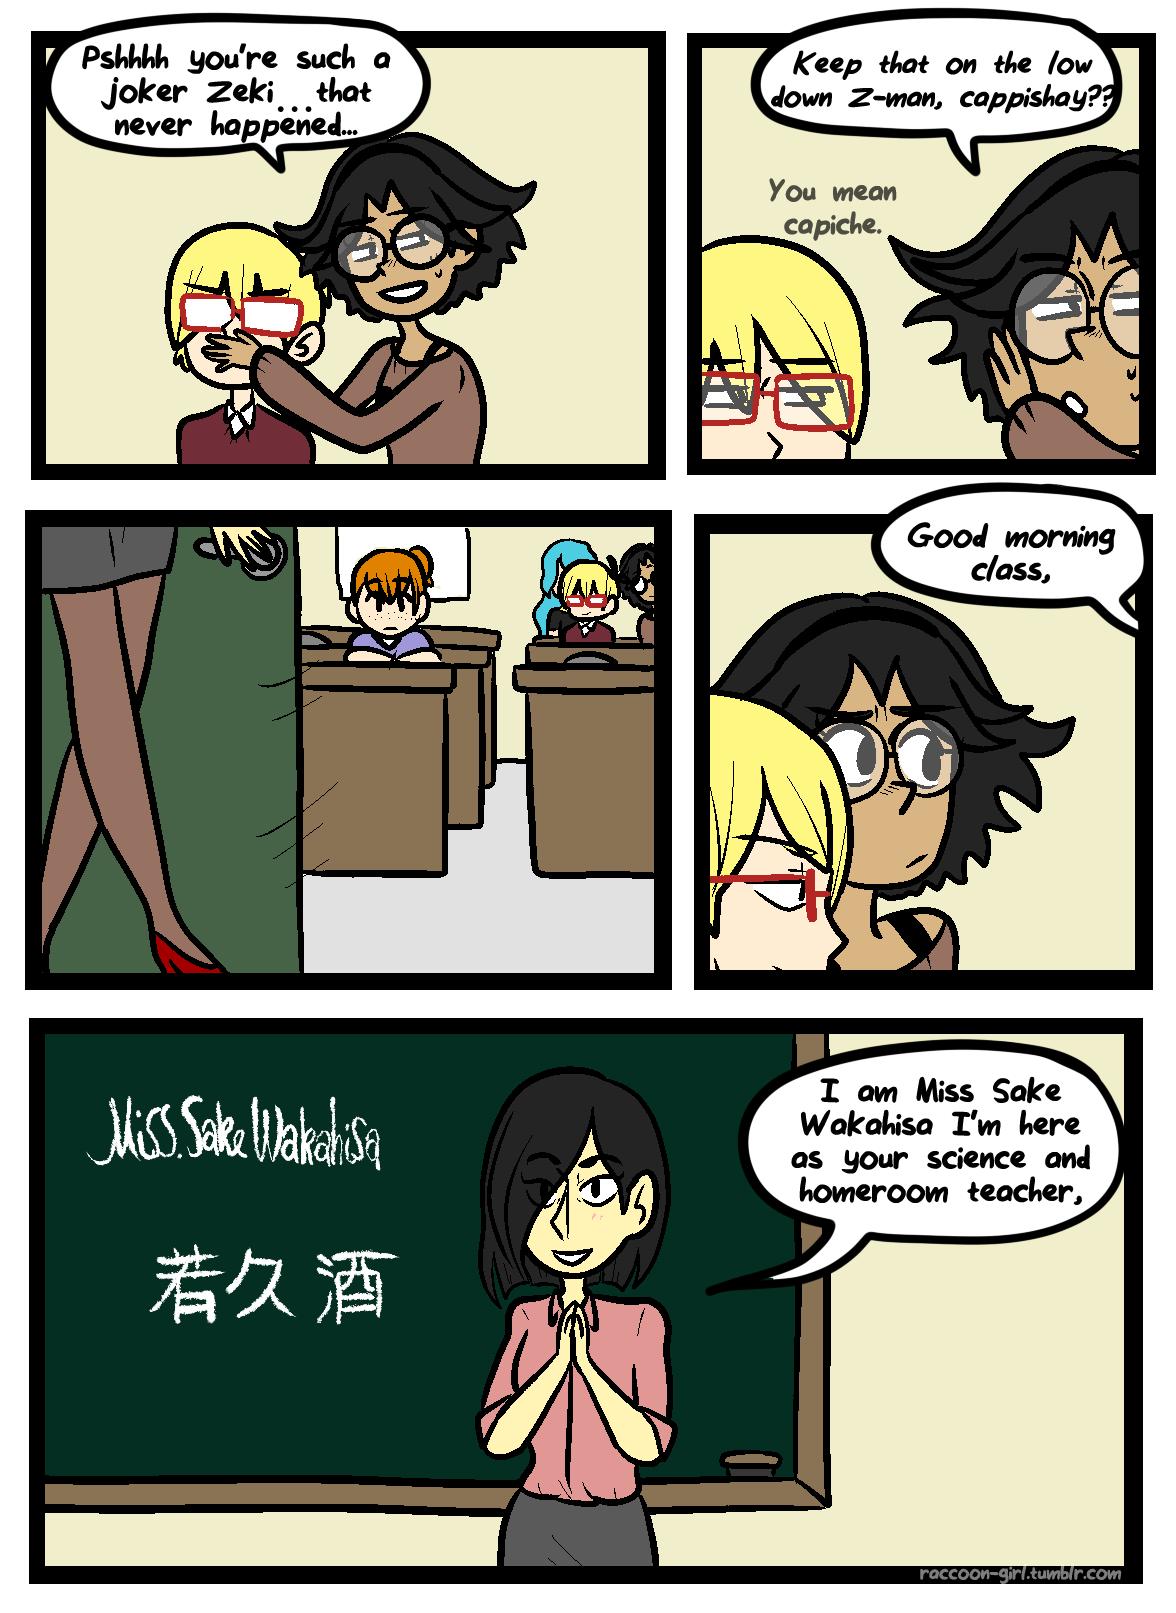 raccoongirl-page16